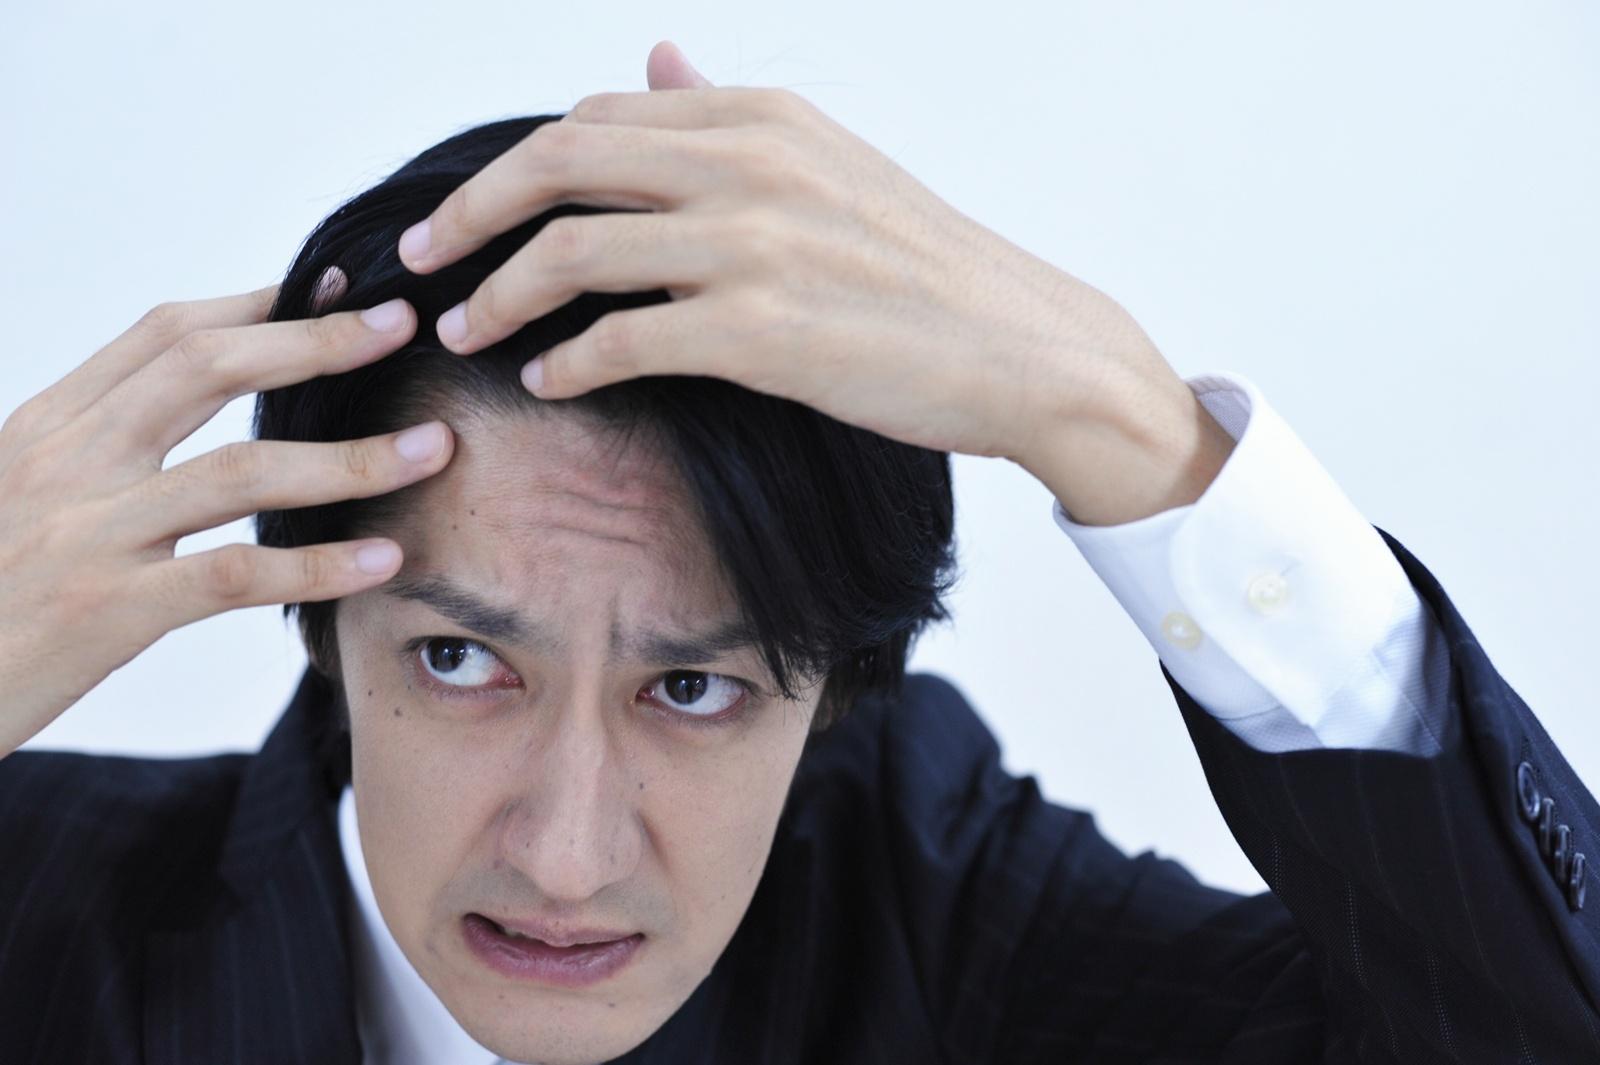 AGAヘアクリニック(ヘアクリ)で薄毛・抜け毛治療 料金設定が明確! スマホのテレビ電話で無料診察が可能!